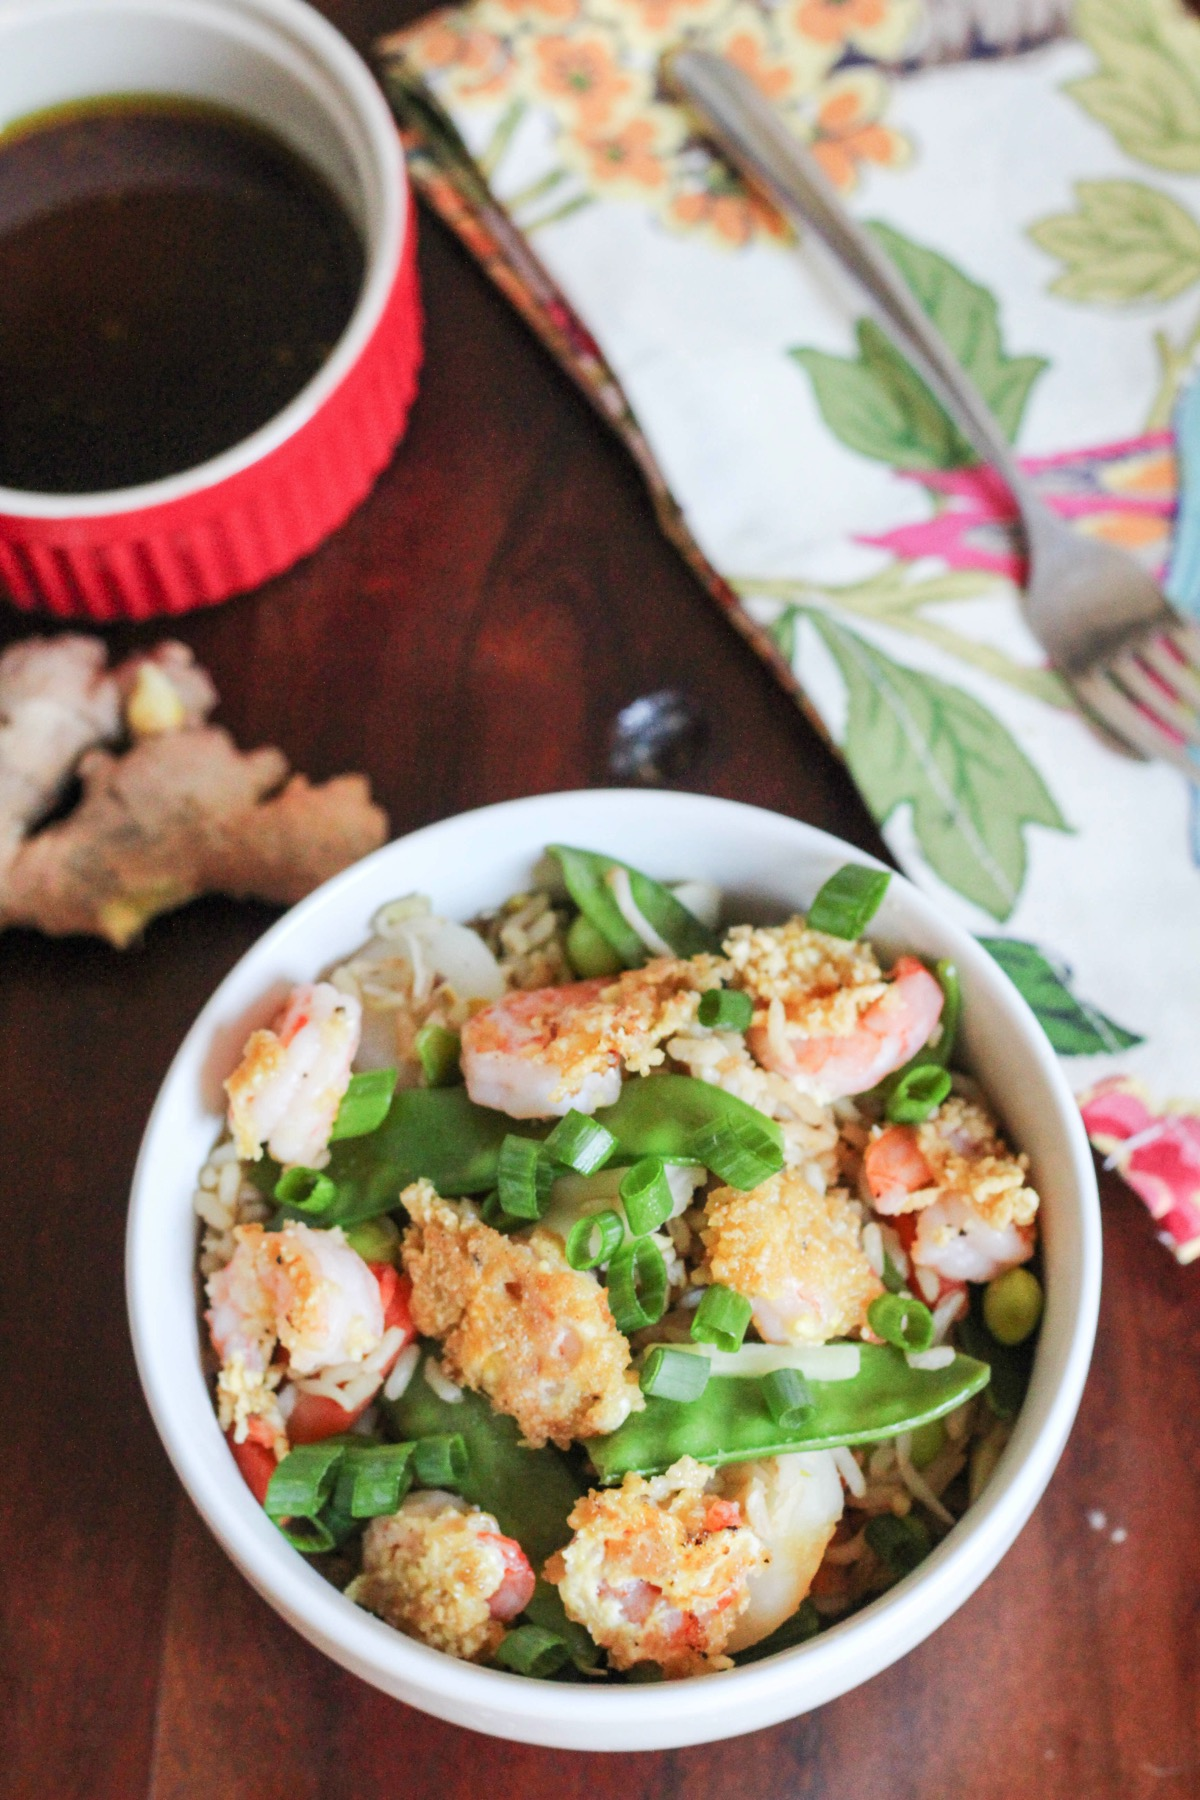 Crispy shrimp and rice 4